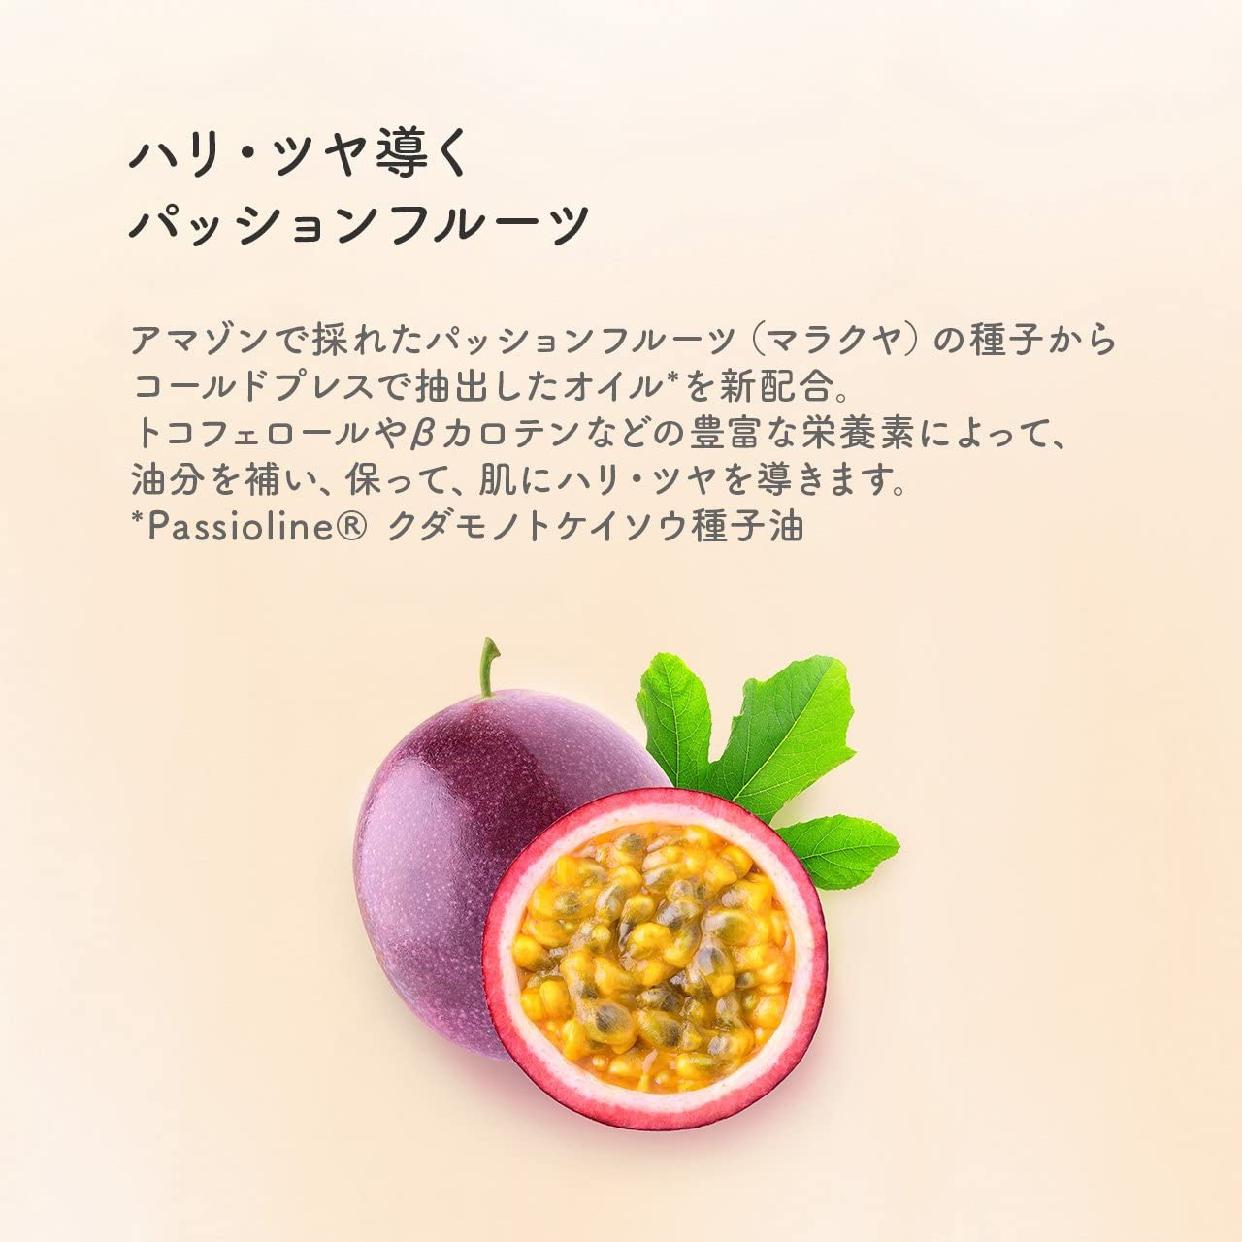 LuLuLun(ルルルン)モイストジェルクリーム (保湿タイプ)の商品画像6